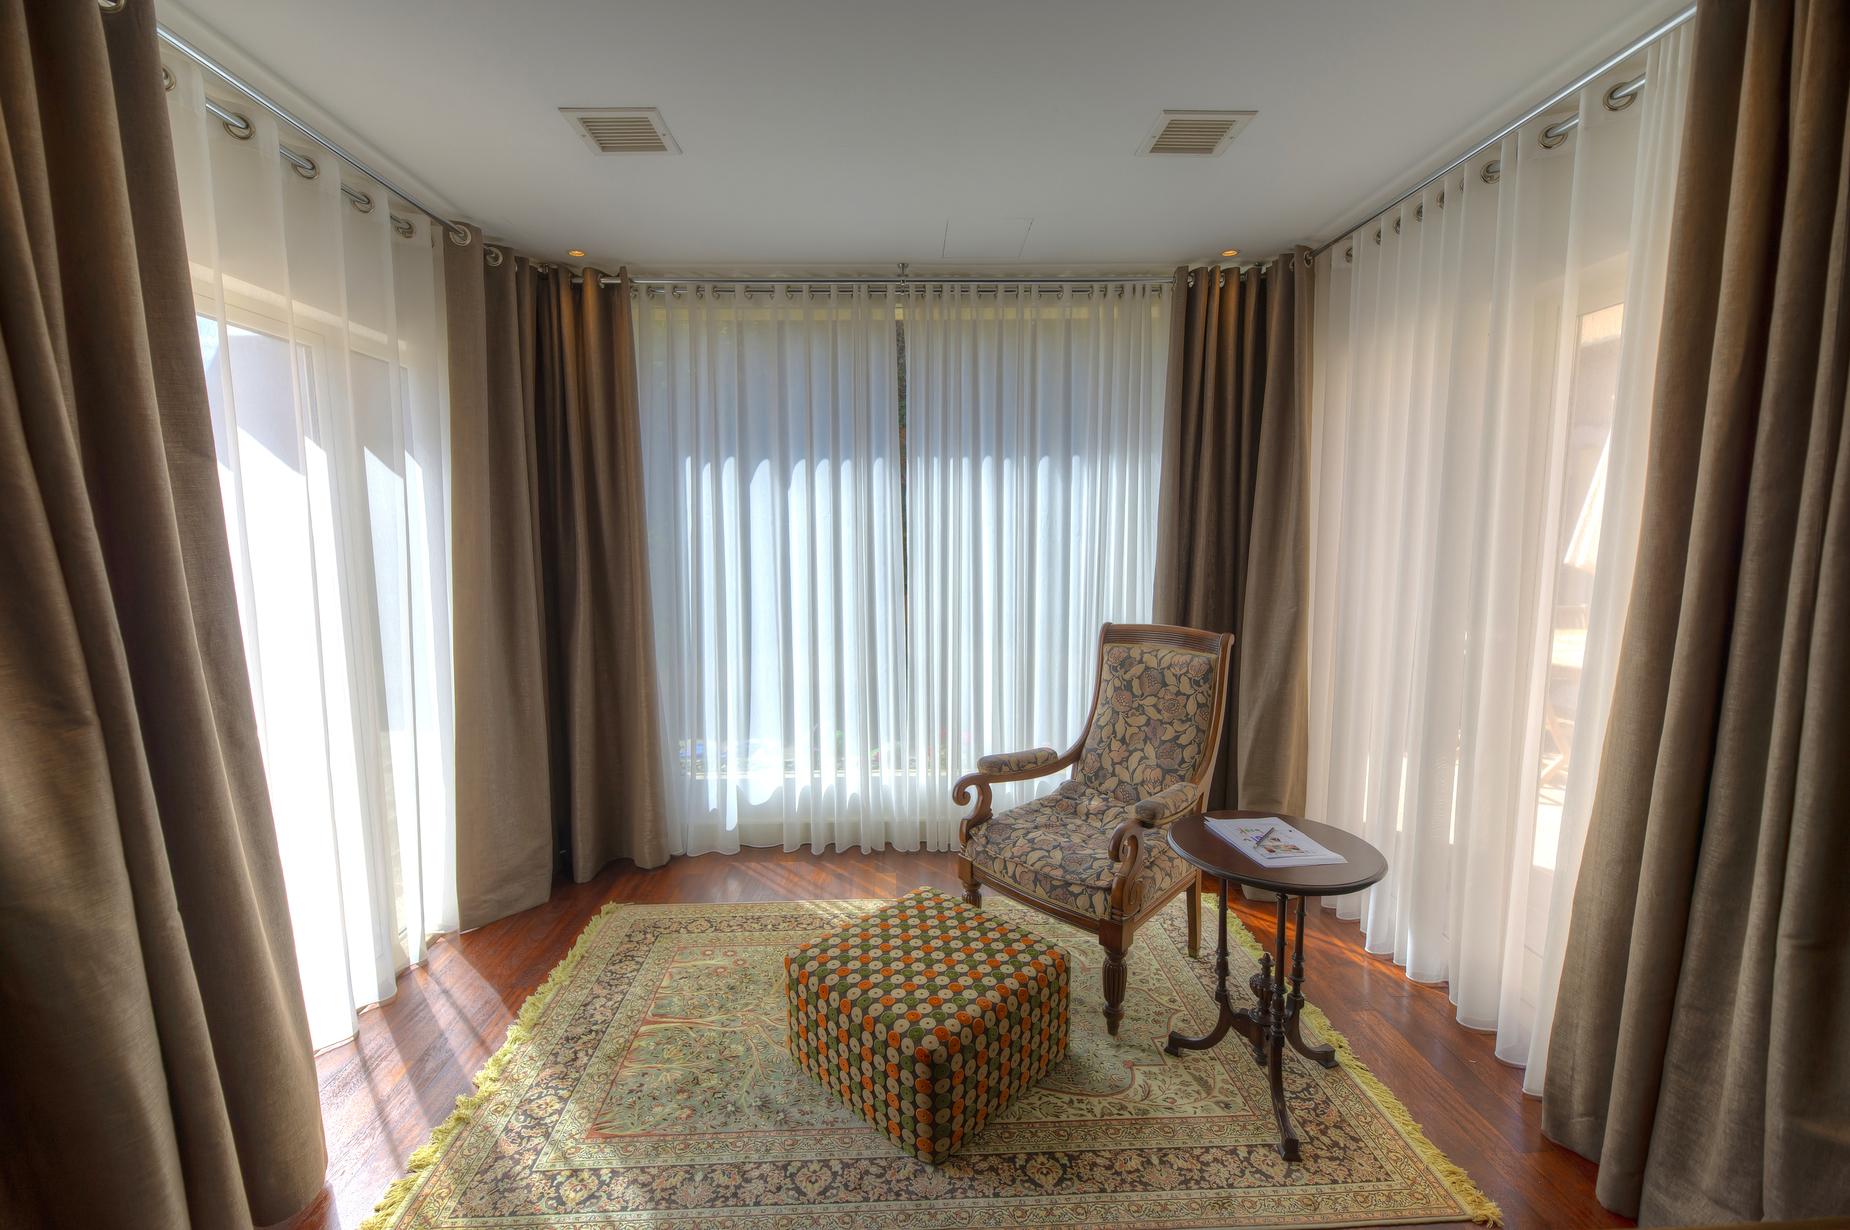 4 bed Villa For Rent in Iklin, Iklin - thumb 12